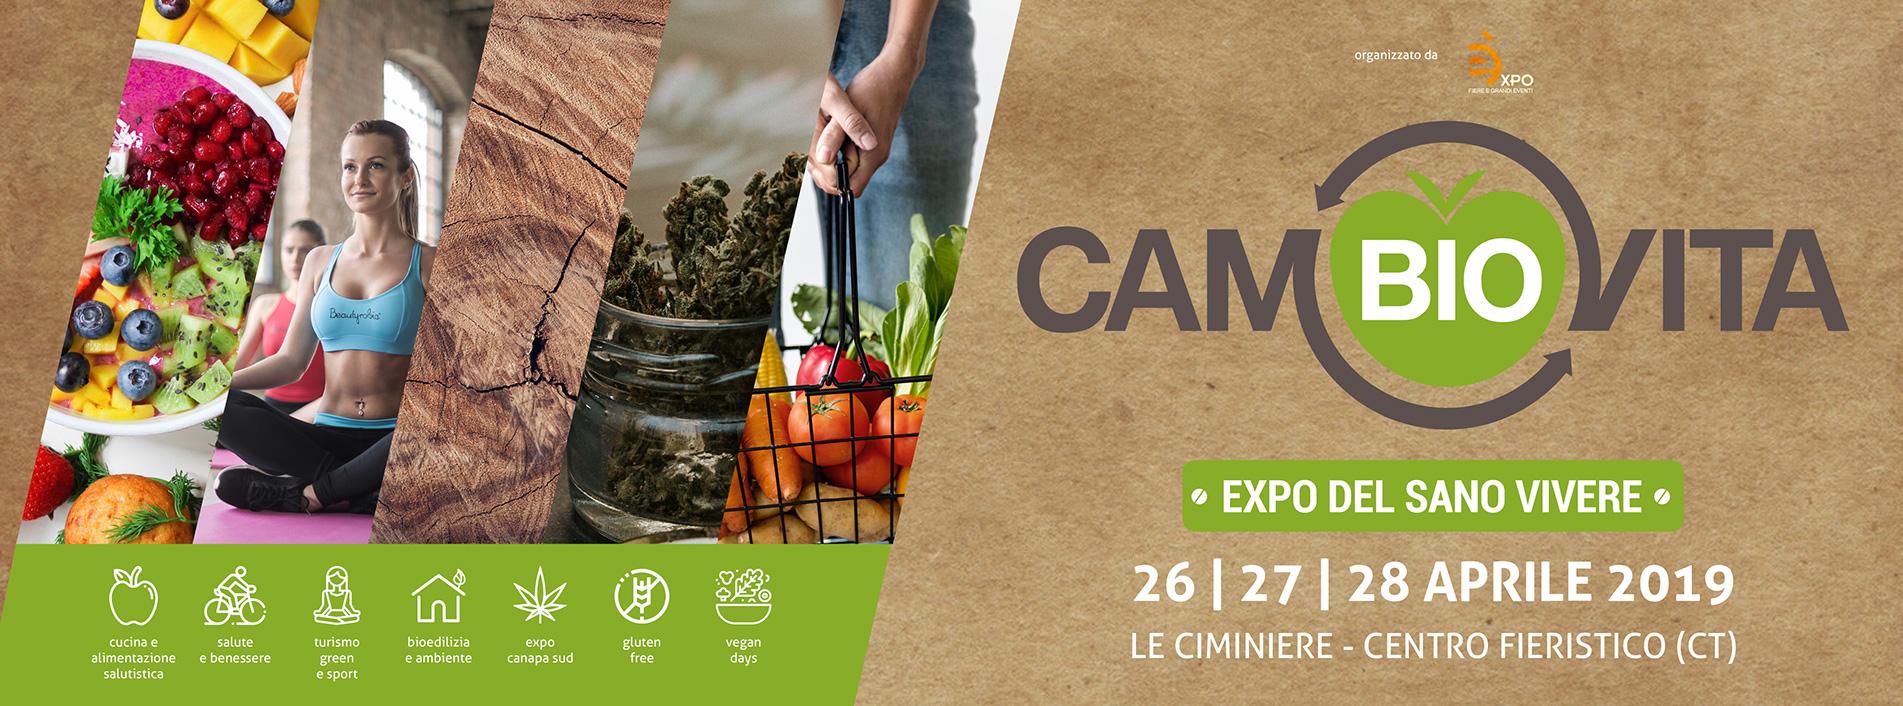 banner-sito-camBIOvita-2019s.png.jpg